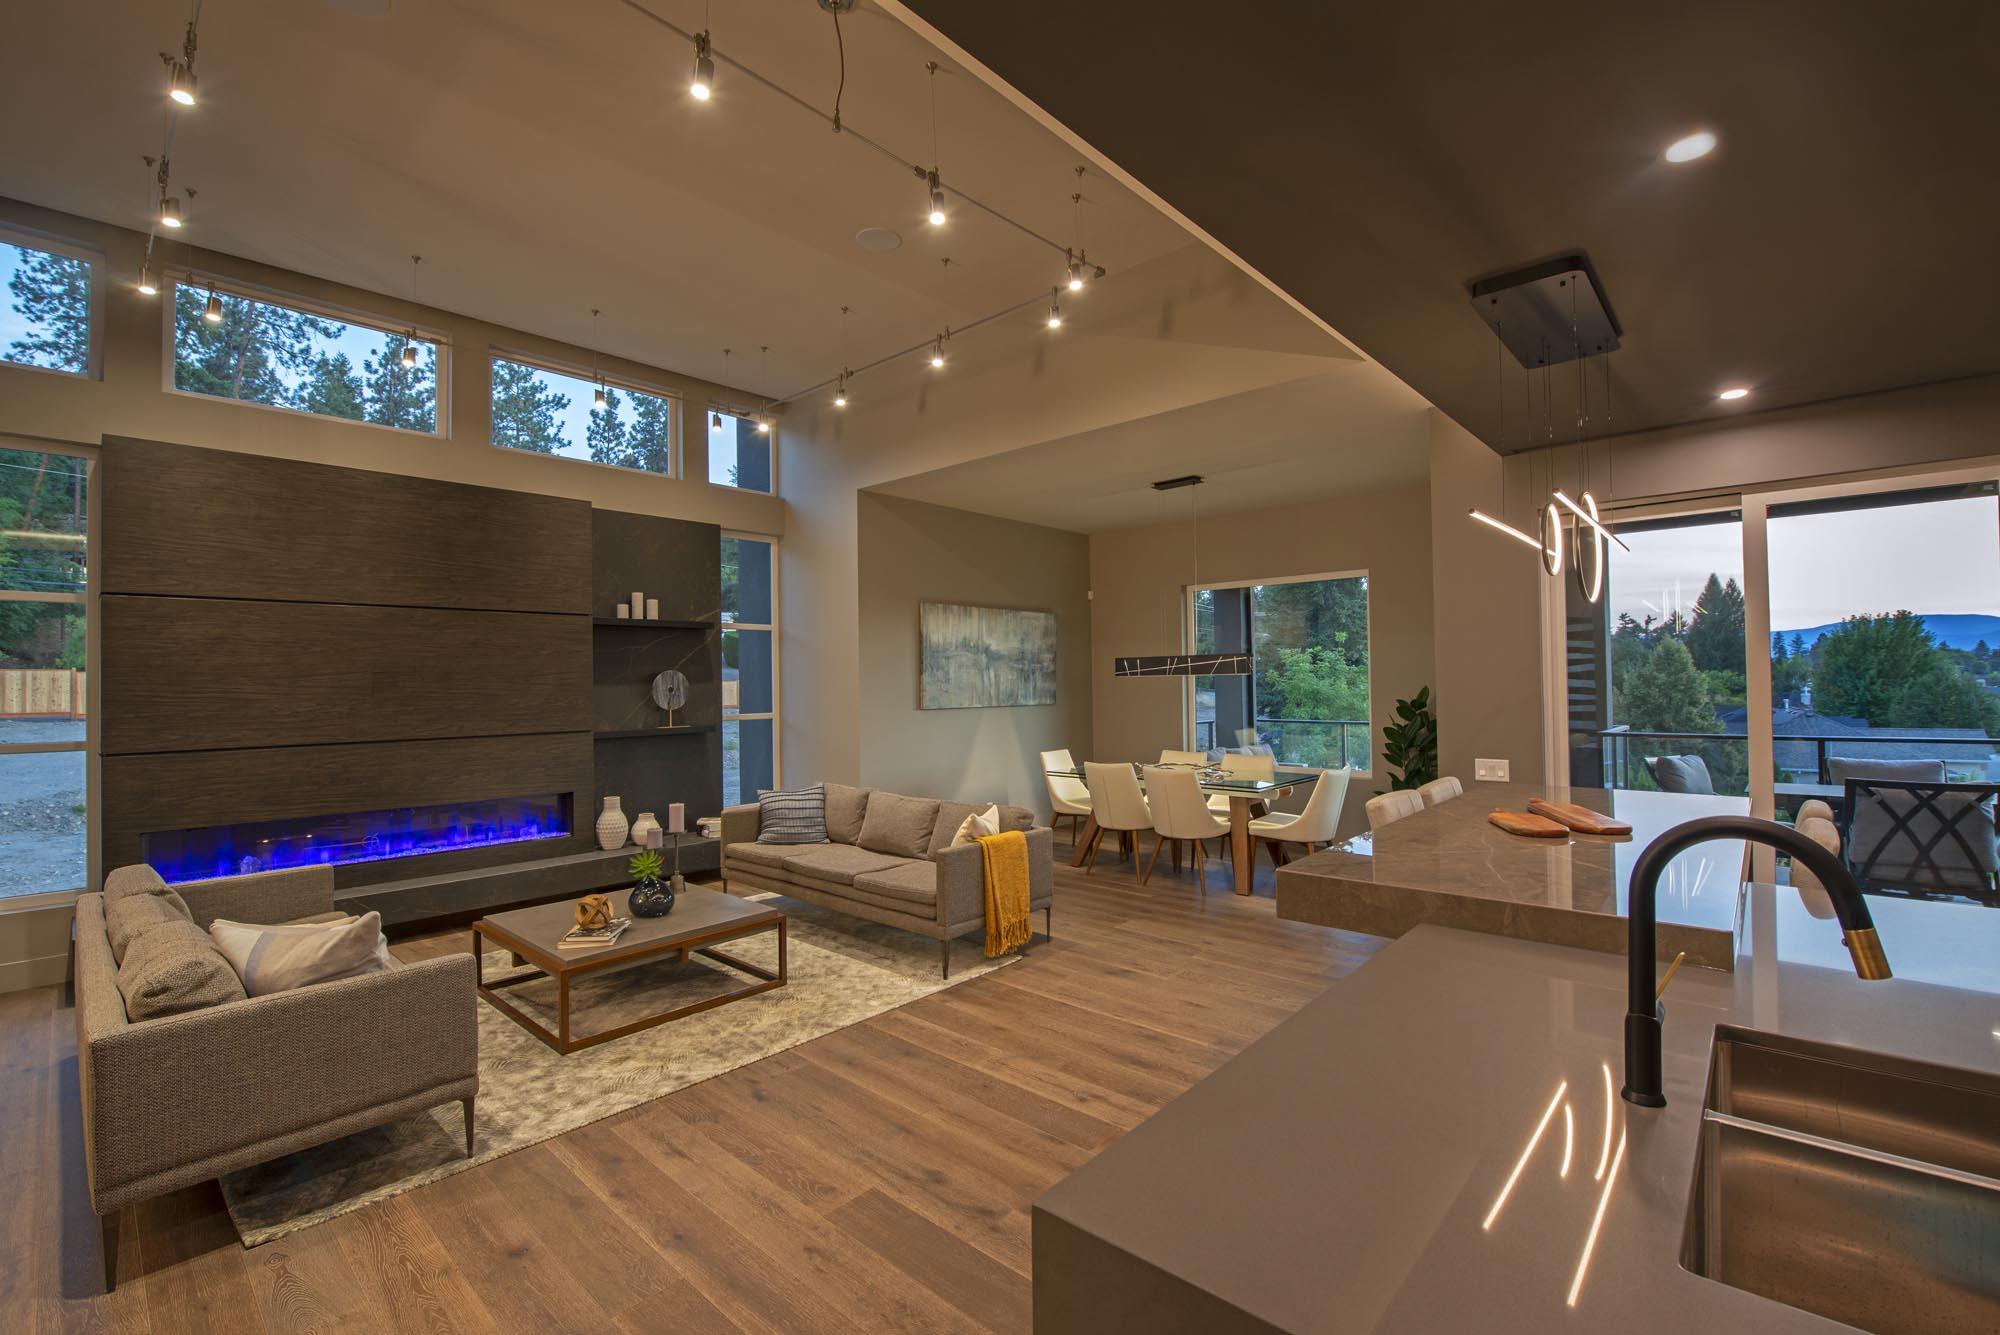 07-Living Room-Dining Room